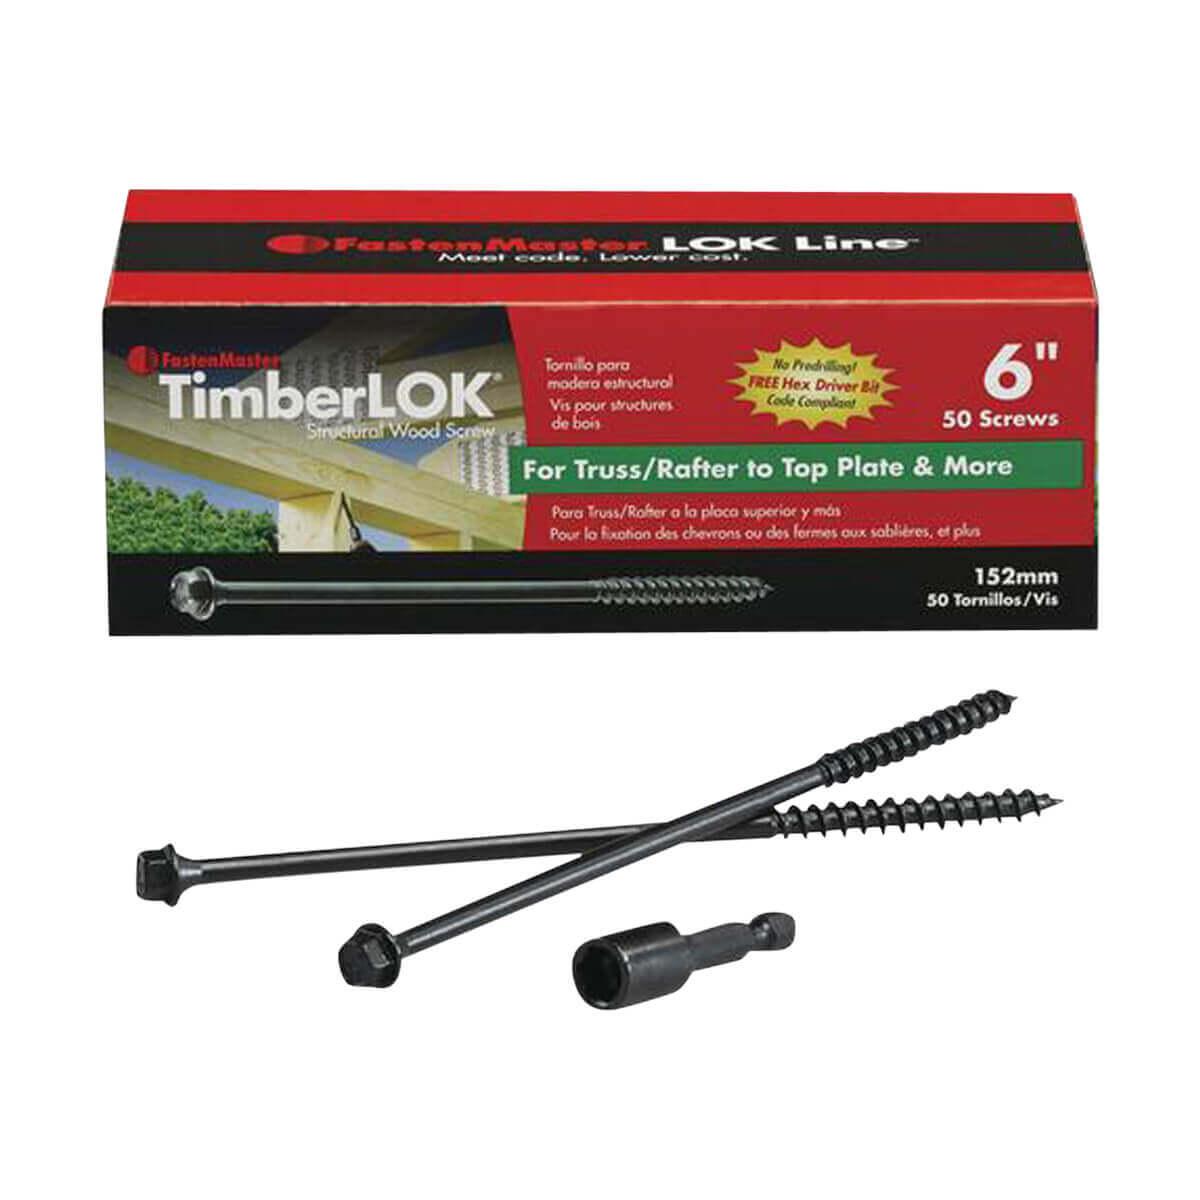 Fastenmaster 6-in Timberlok Screws - 50 Pack